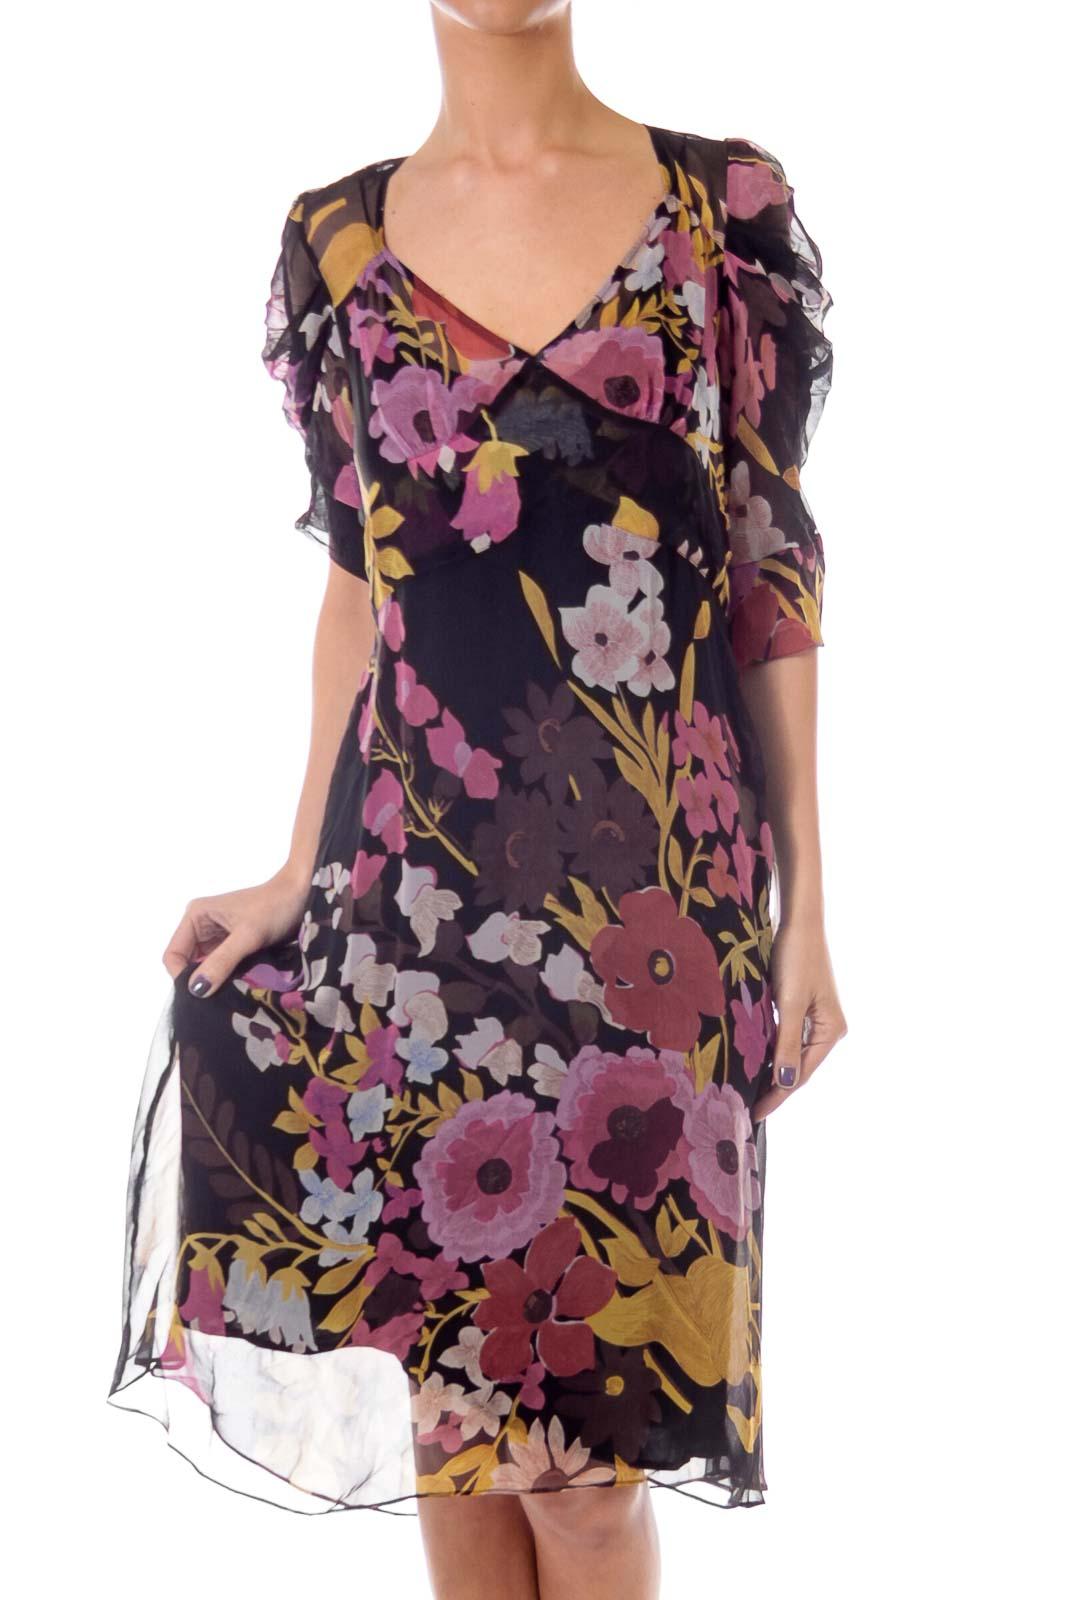 Black Flower Print See Through Dress Front